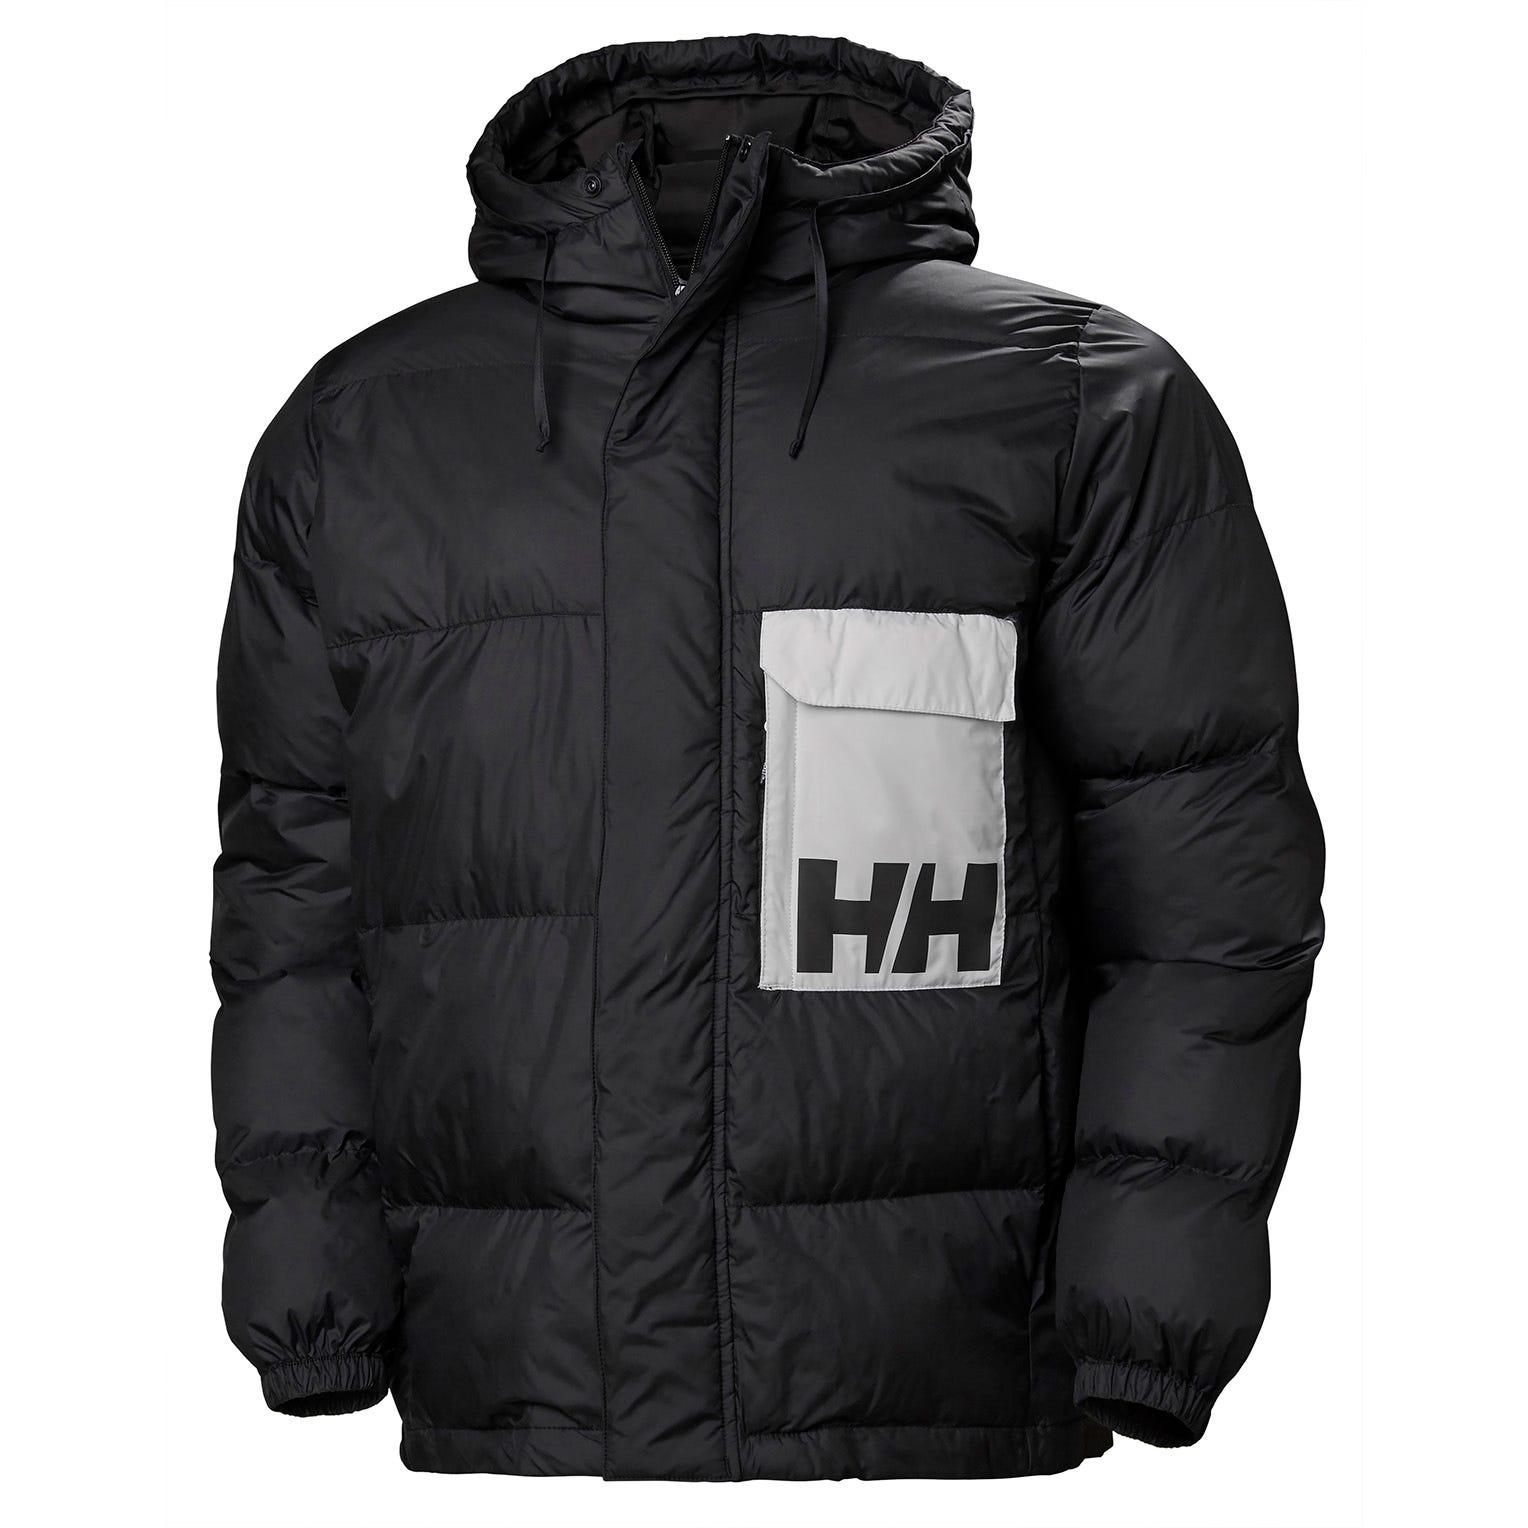 Helly Hansen Pc Puffer Jacket Mens Black XL